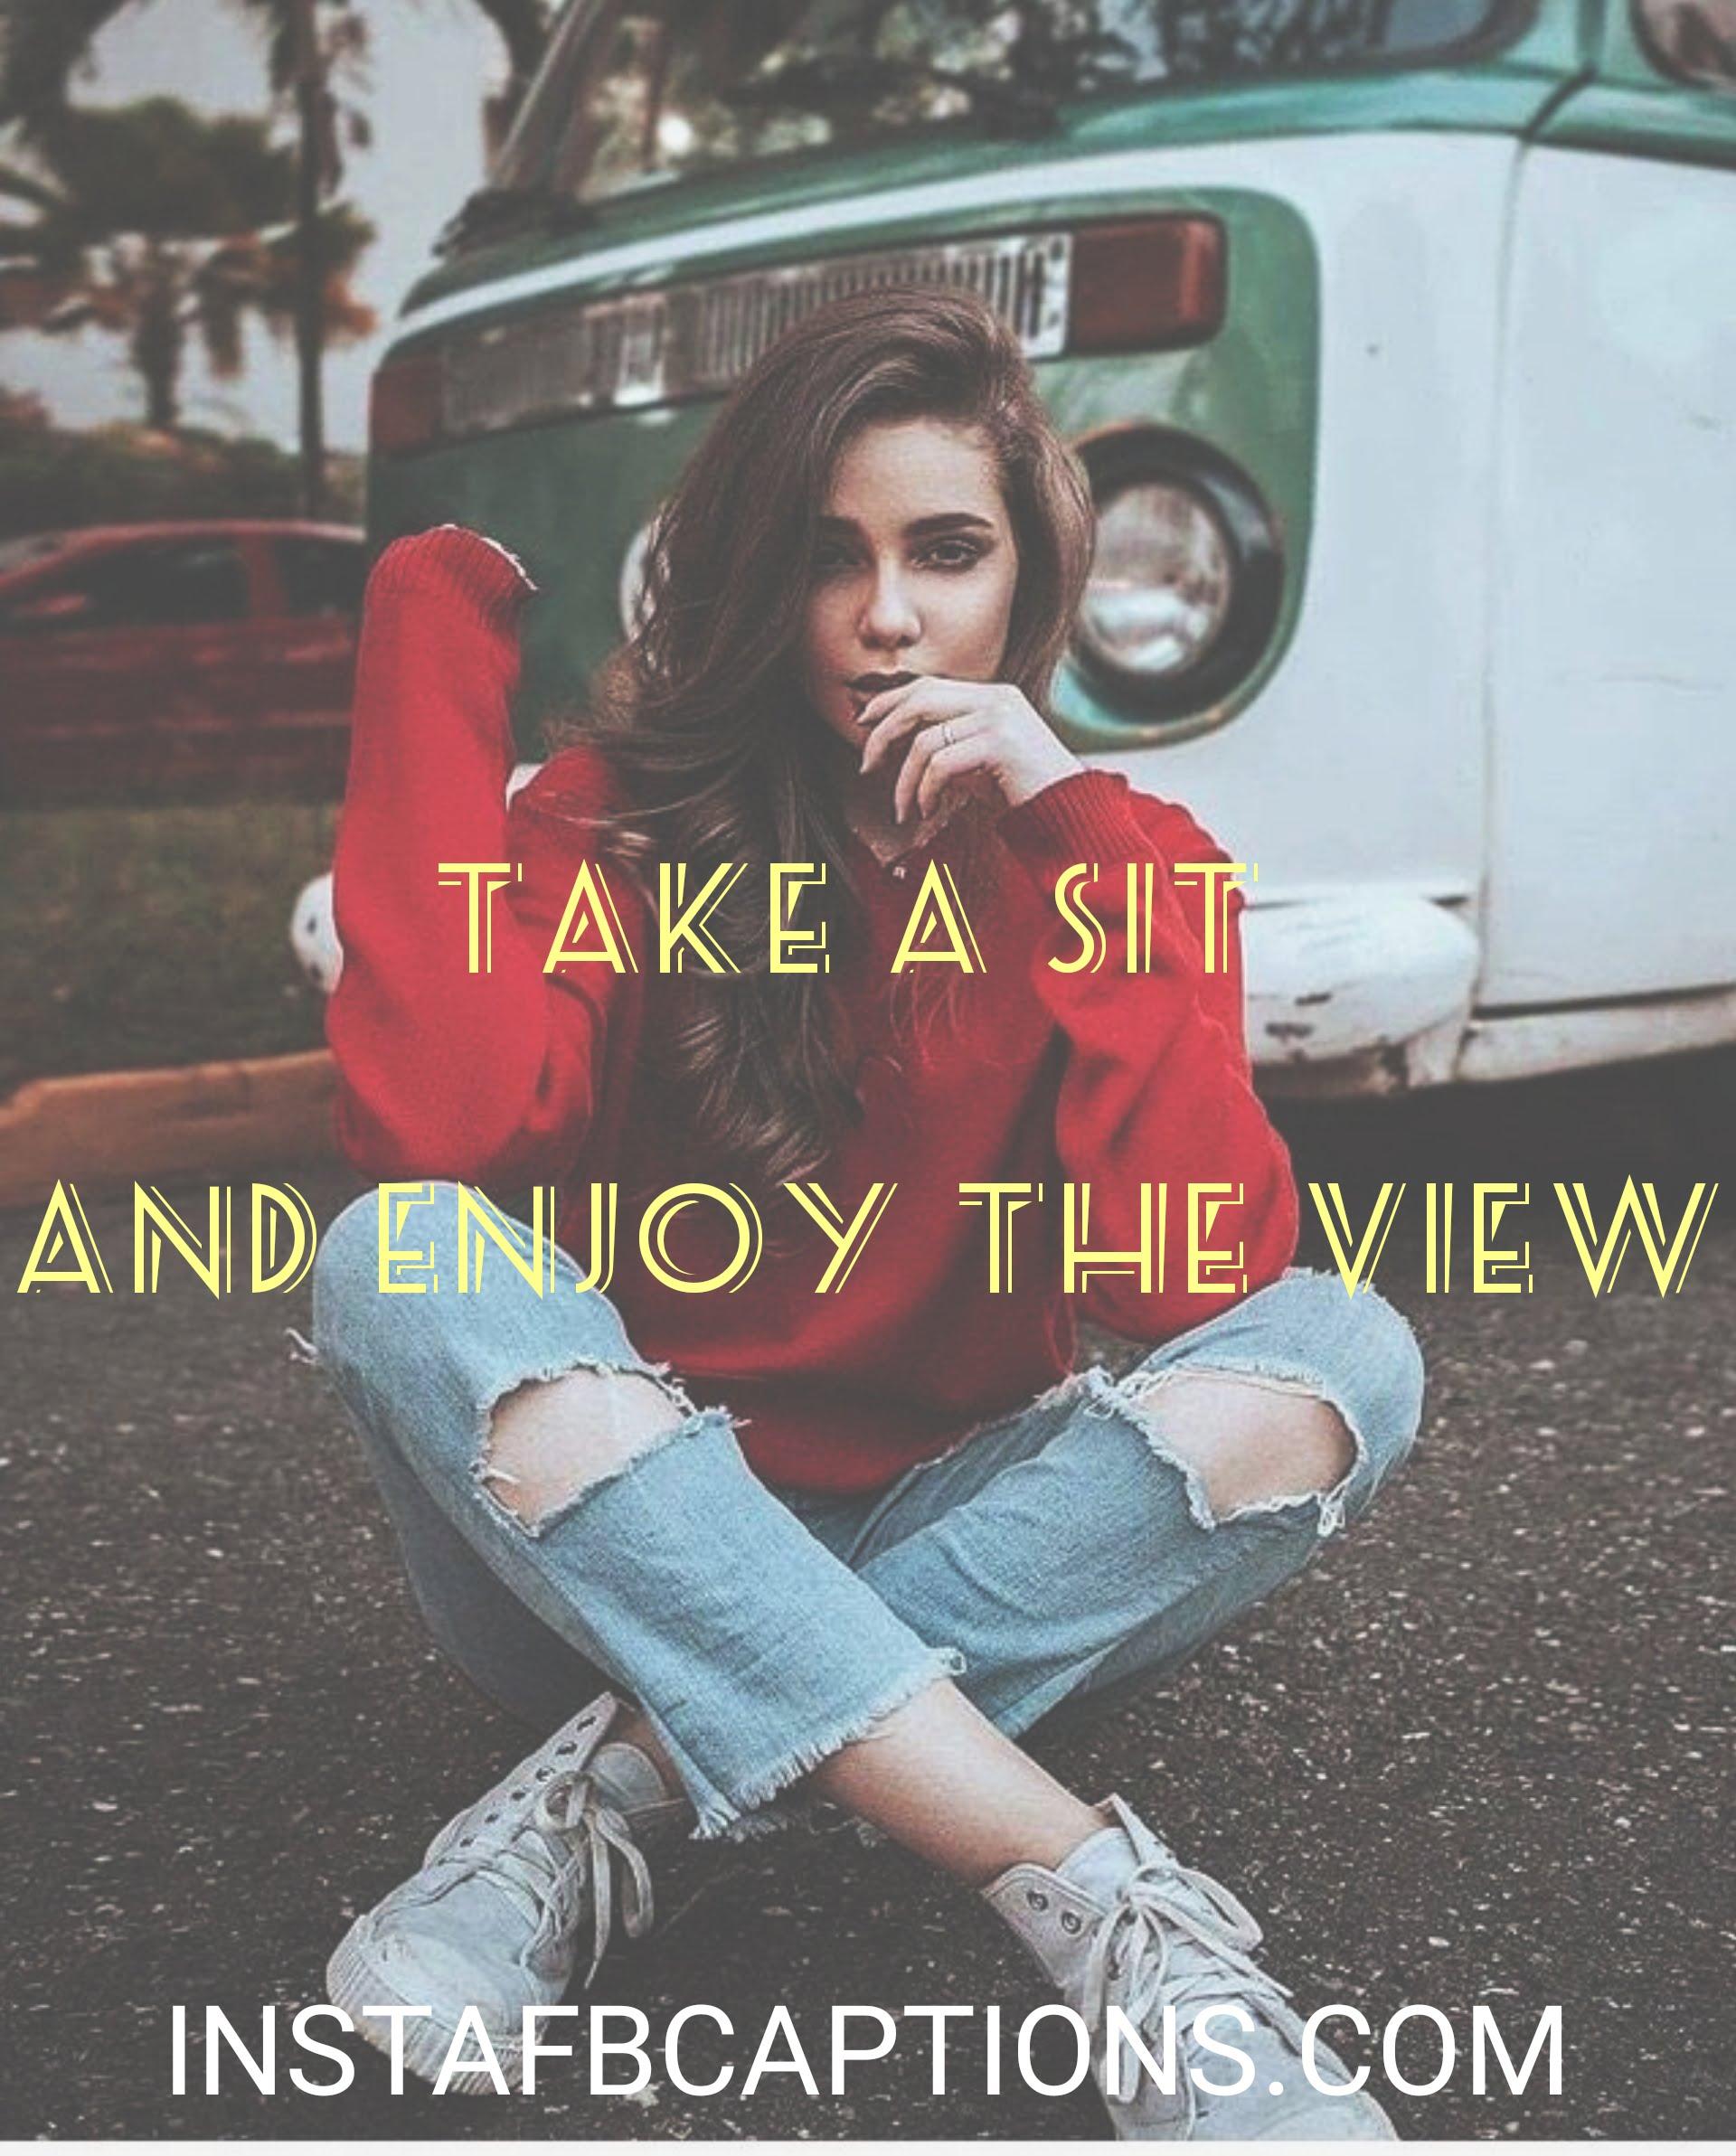 Sitting On Road Captions  - Sitting on road captions - 120+ SITTING POSE Instagram captions 2021